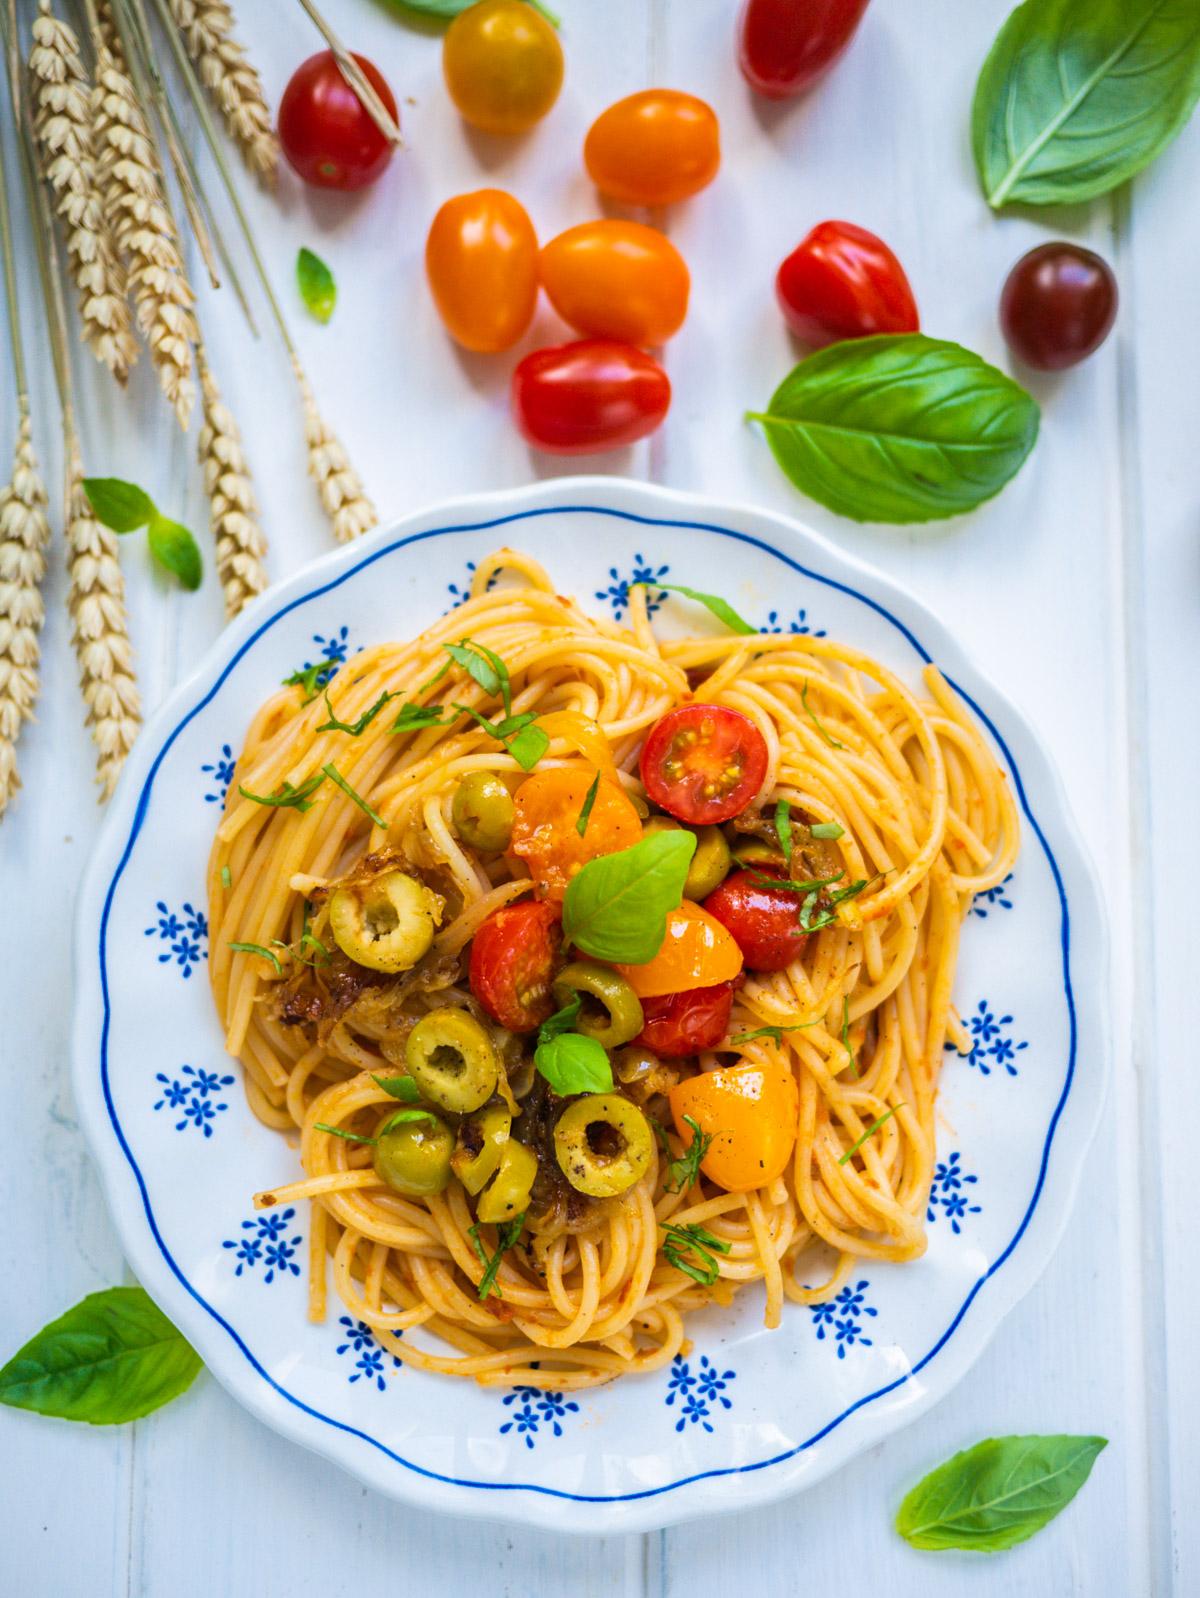 Spaghettis aux tomates cerises